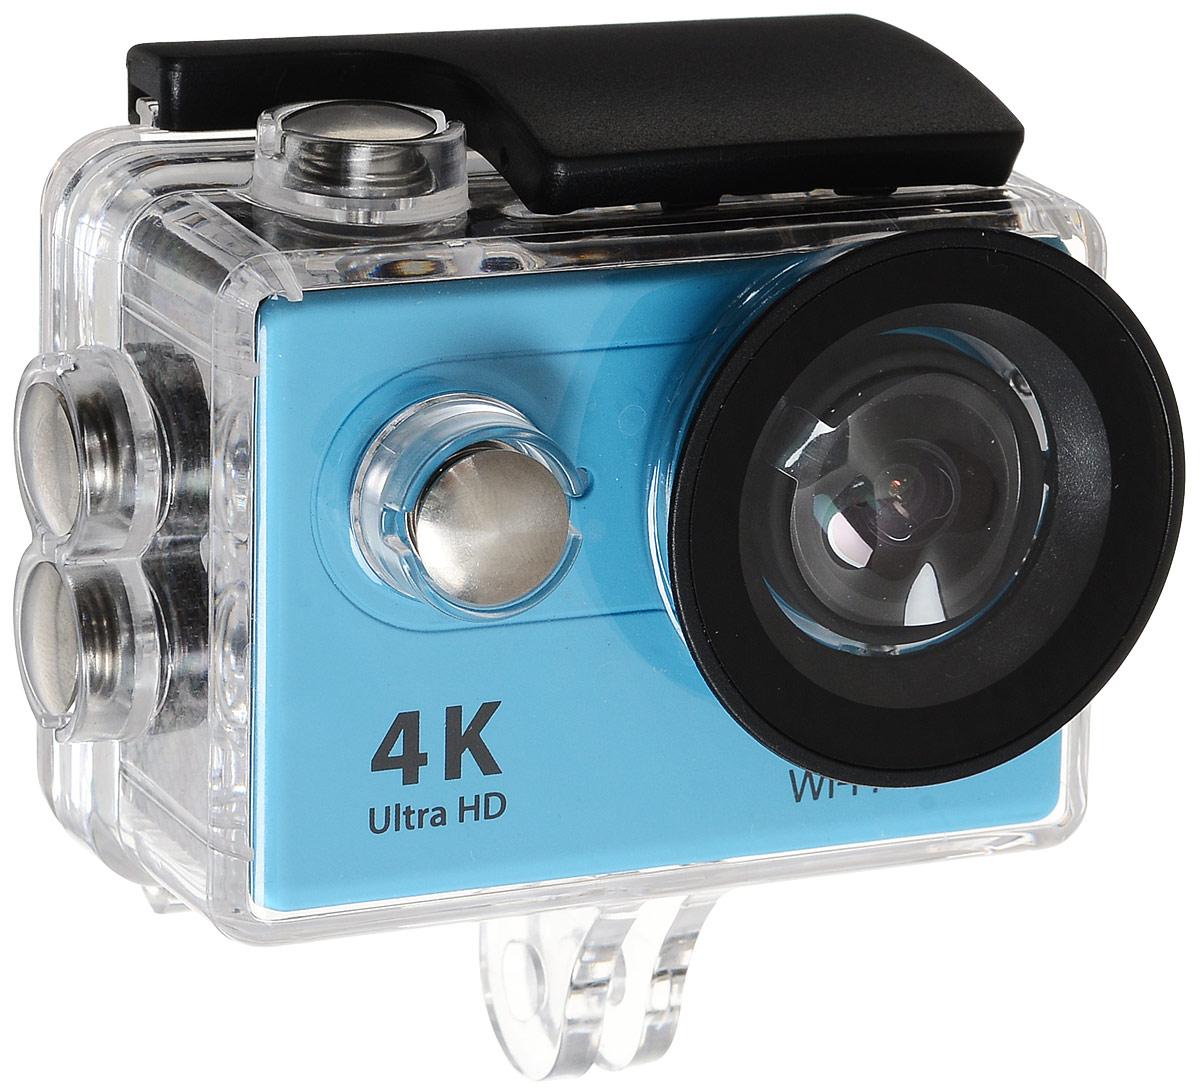 Eken H9R Ultra HD, Blue экшн-камера - Цифровые видеокамеры